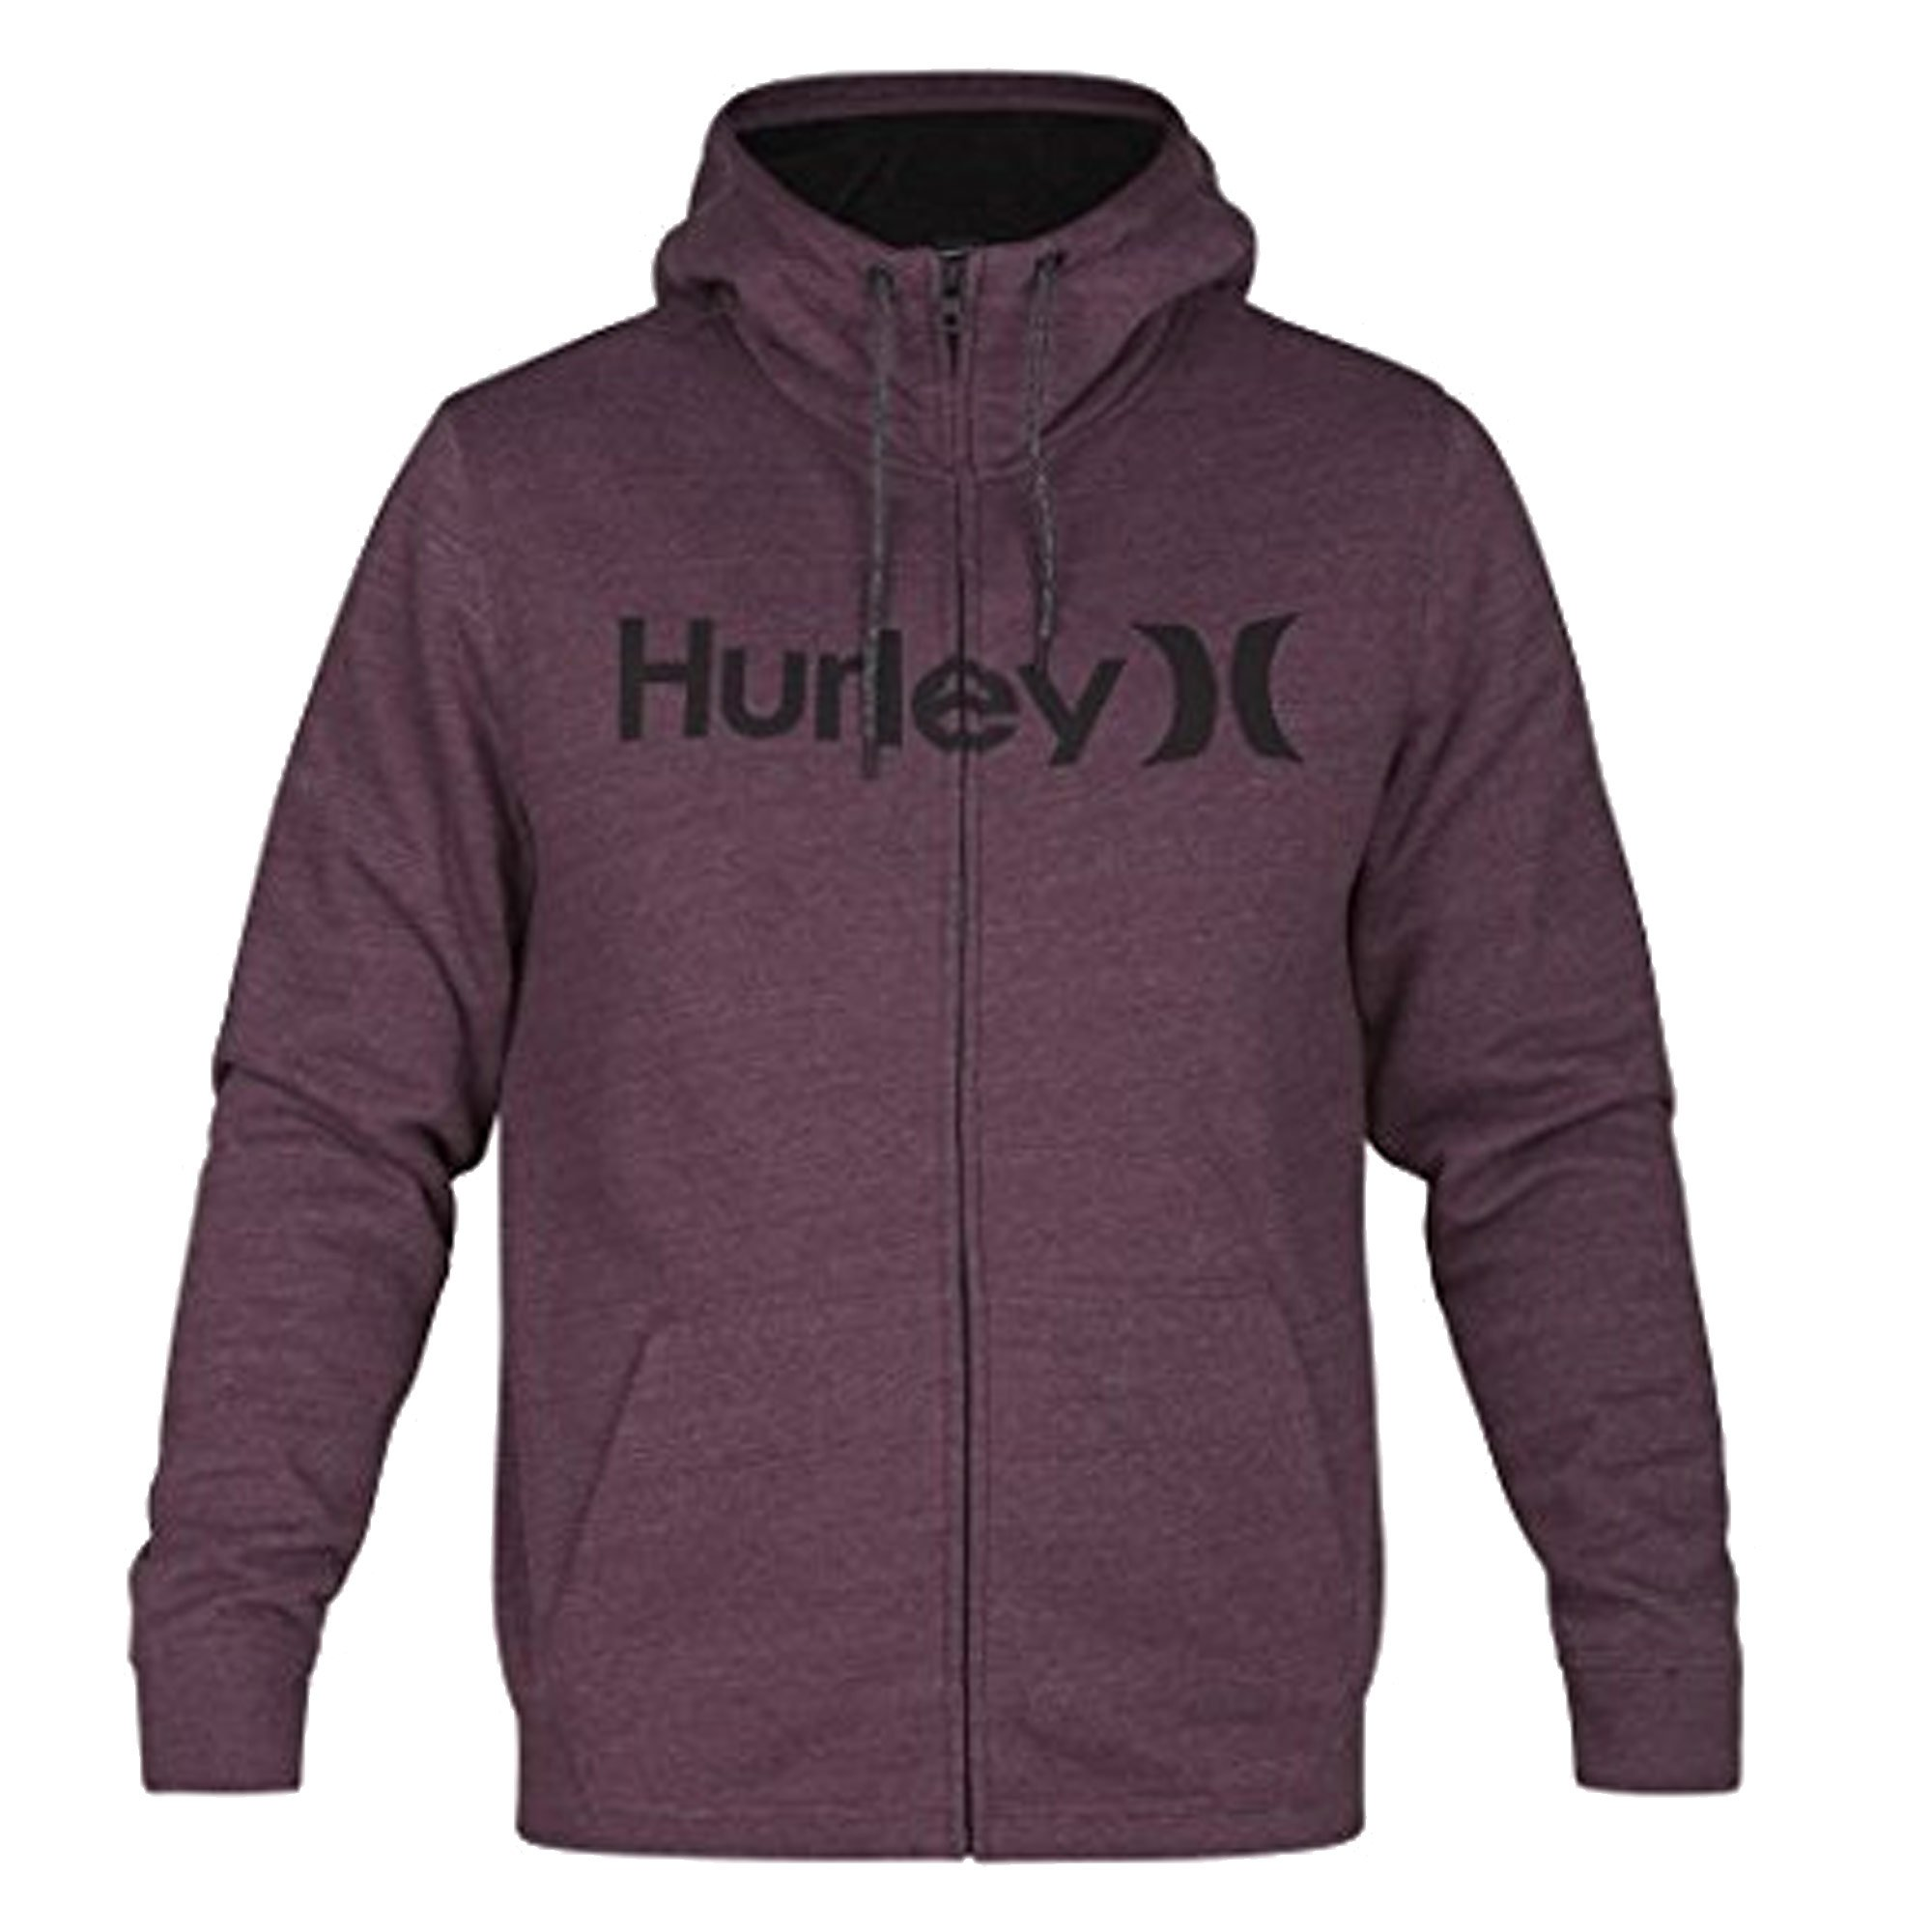 Hurley MFT0007590 Men's Bayside Sherpa Hoodie, Mahogany - M